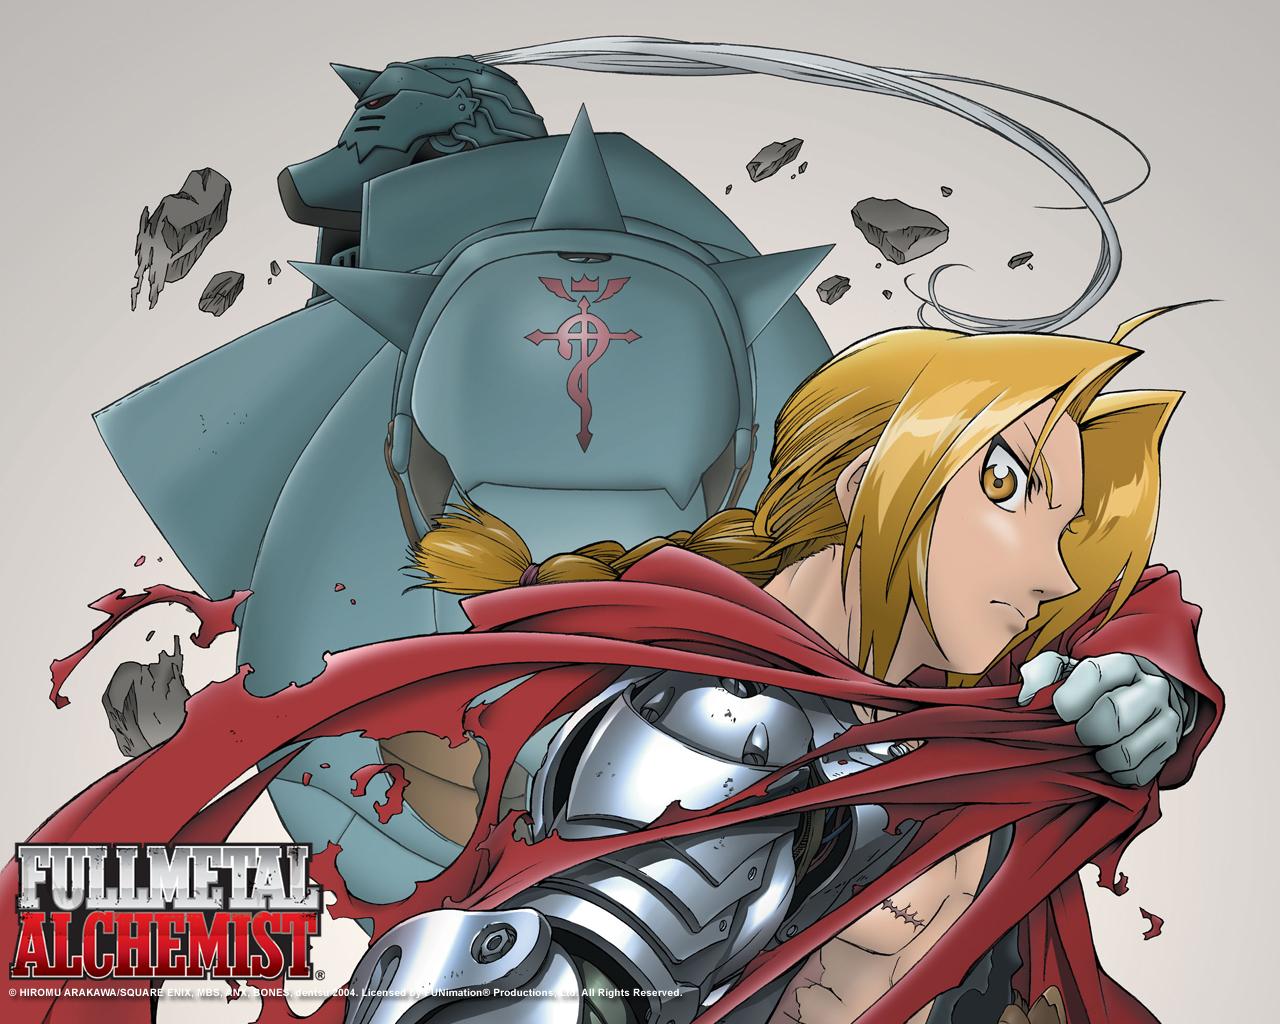 fullmetal alchemist alphonse elric edward HD Wallpaper   Anime Manga 1280x1024